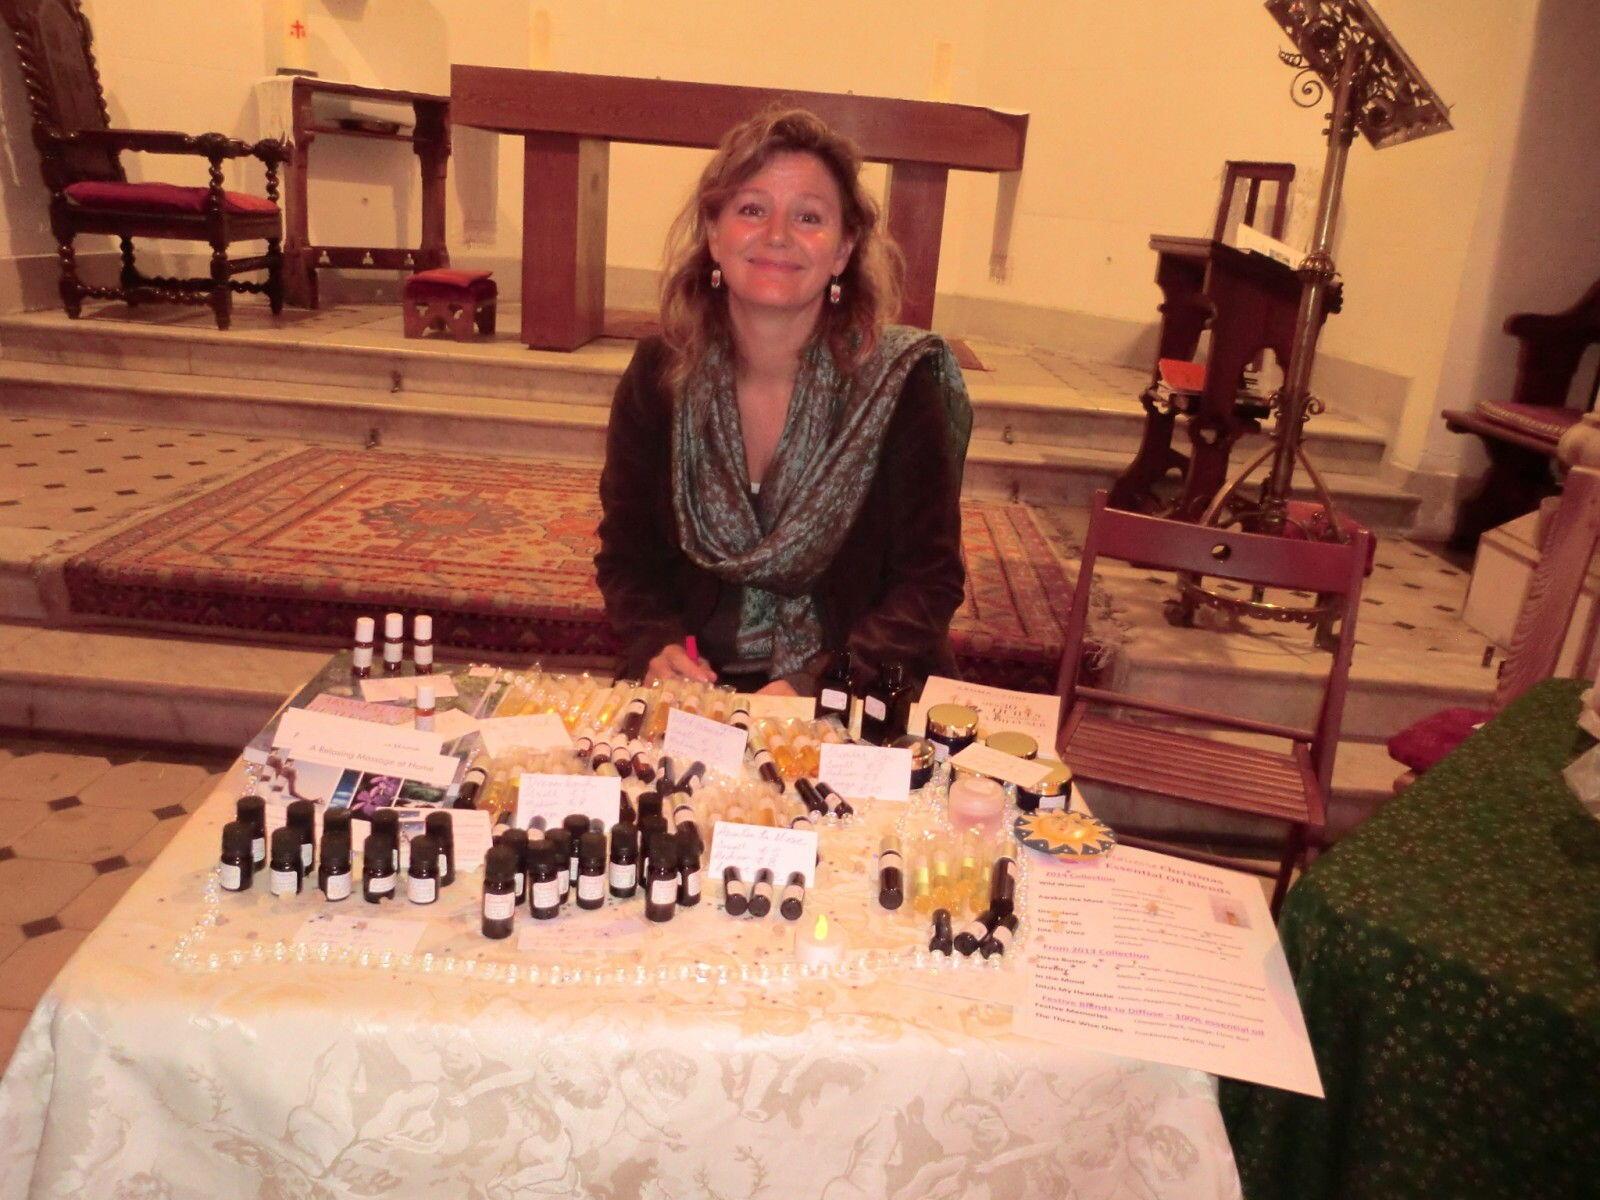 Claire McAlpine Flairesse Massage Provence #Massage @Flairesse